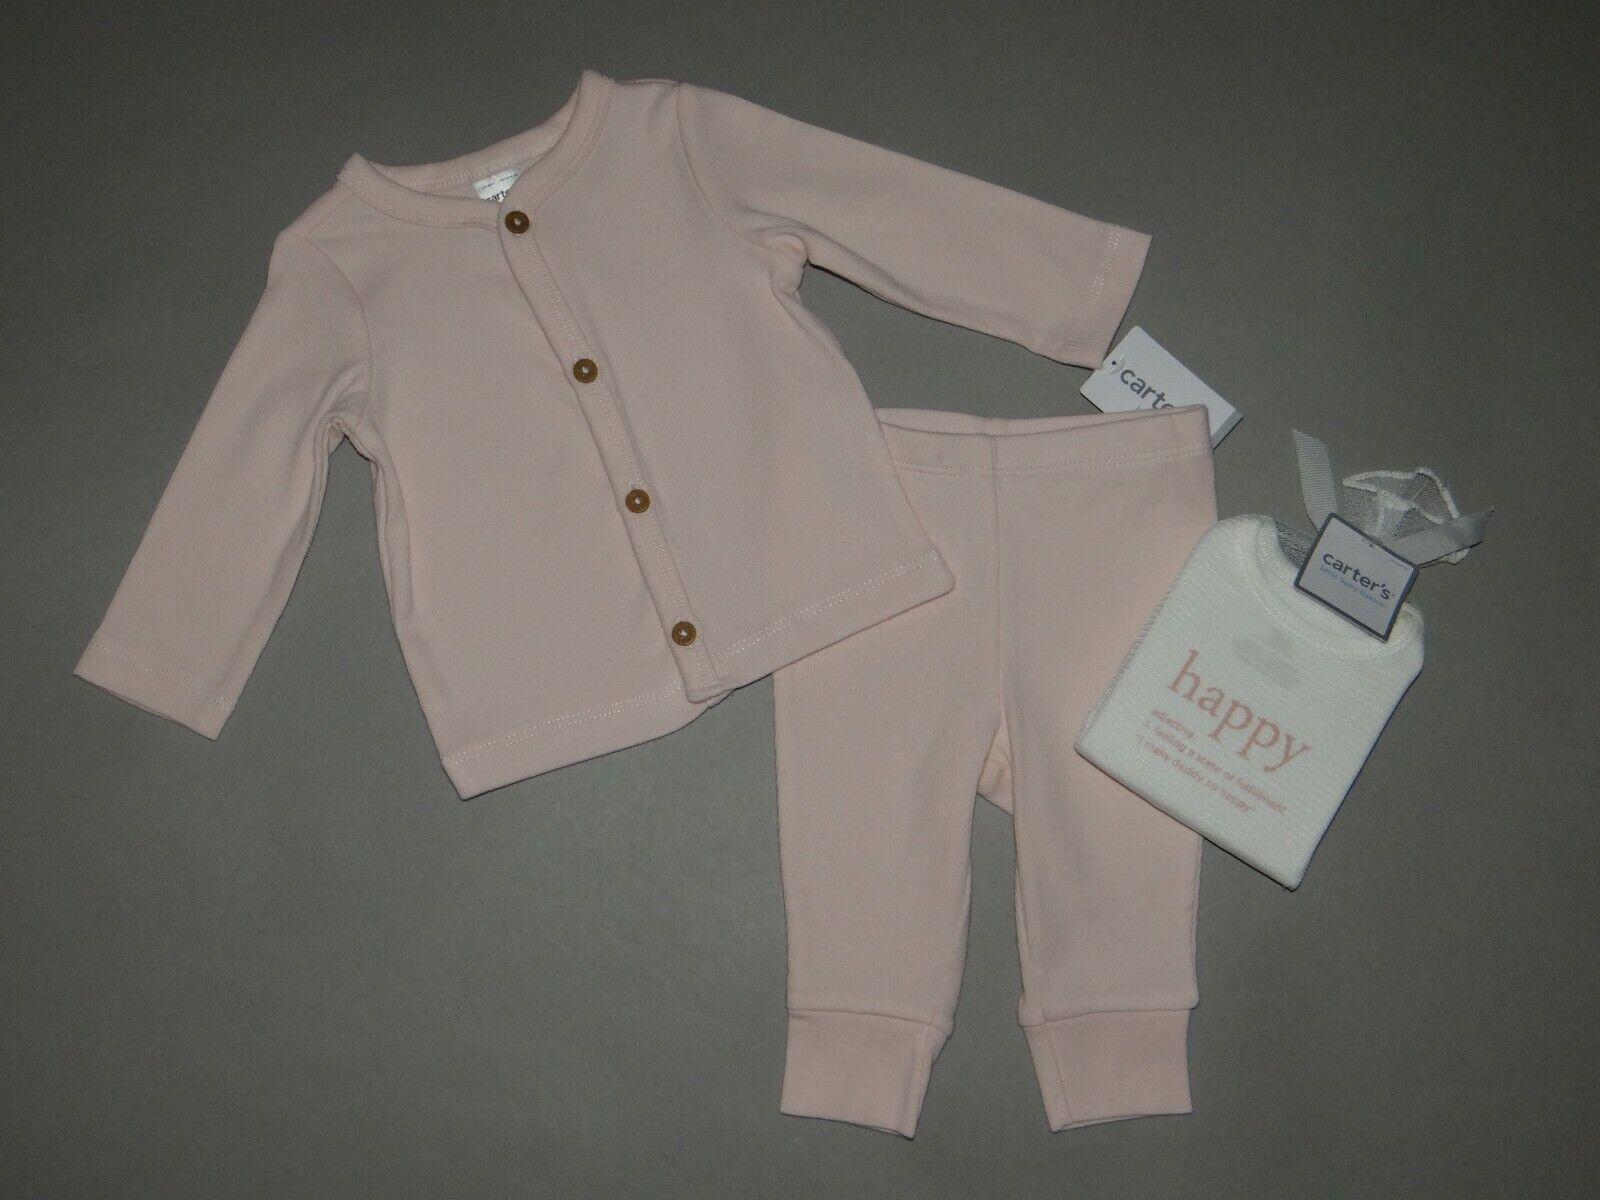 Baby girl clothes, 3 months, Carter's Cardigan 3 piece set